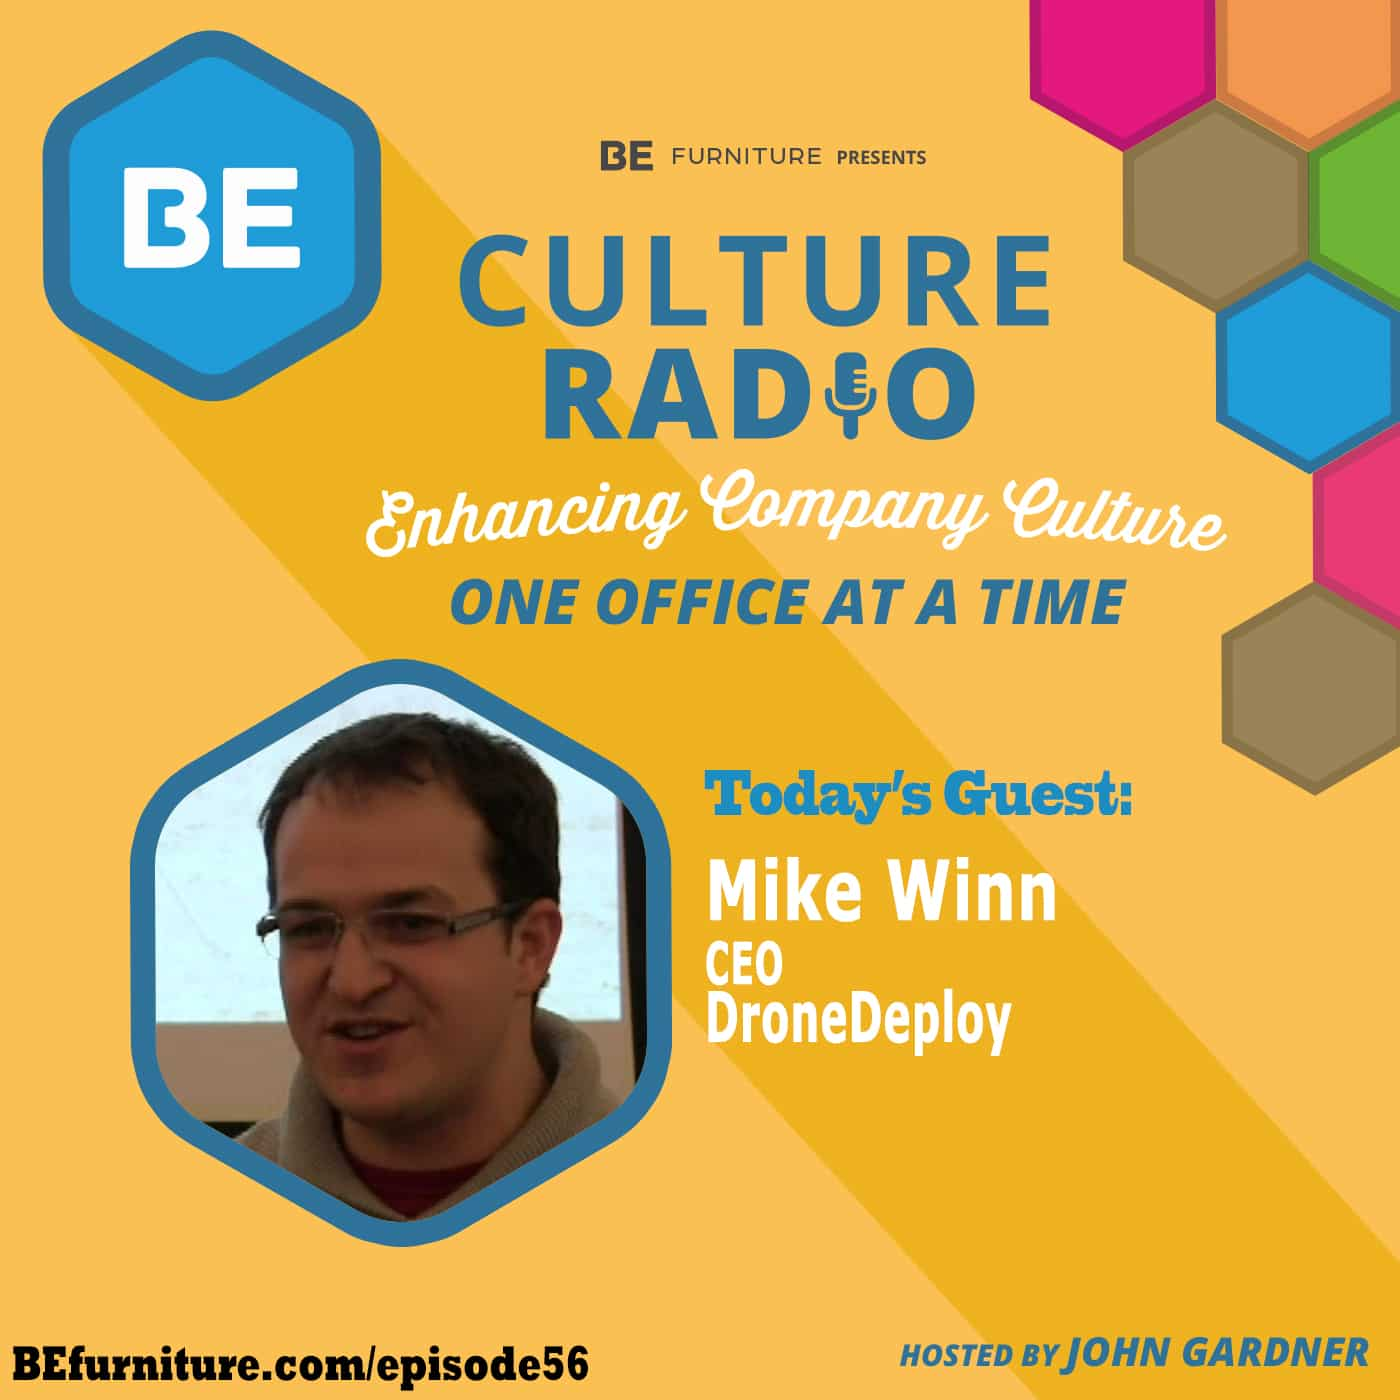 Mike Winn - CEO, DroneDeploy